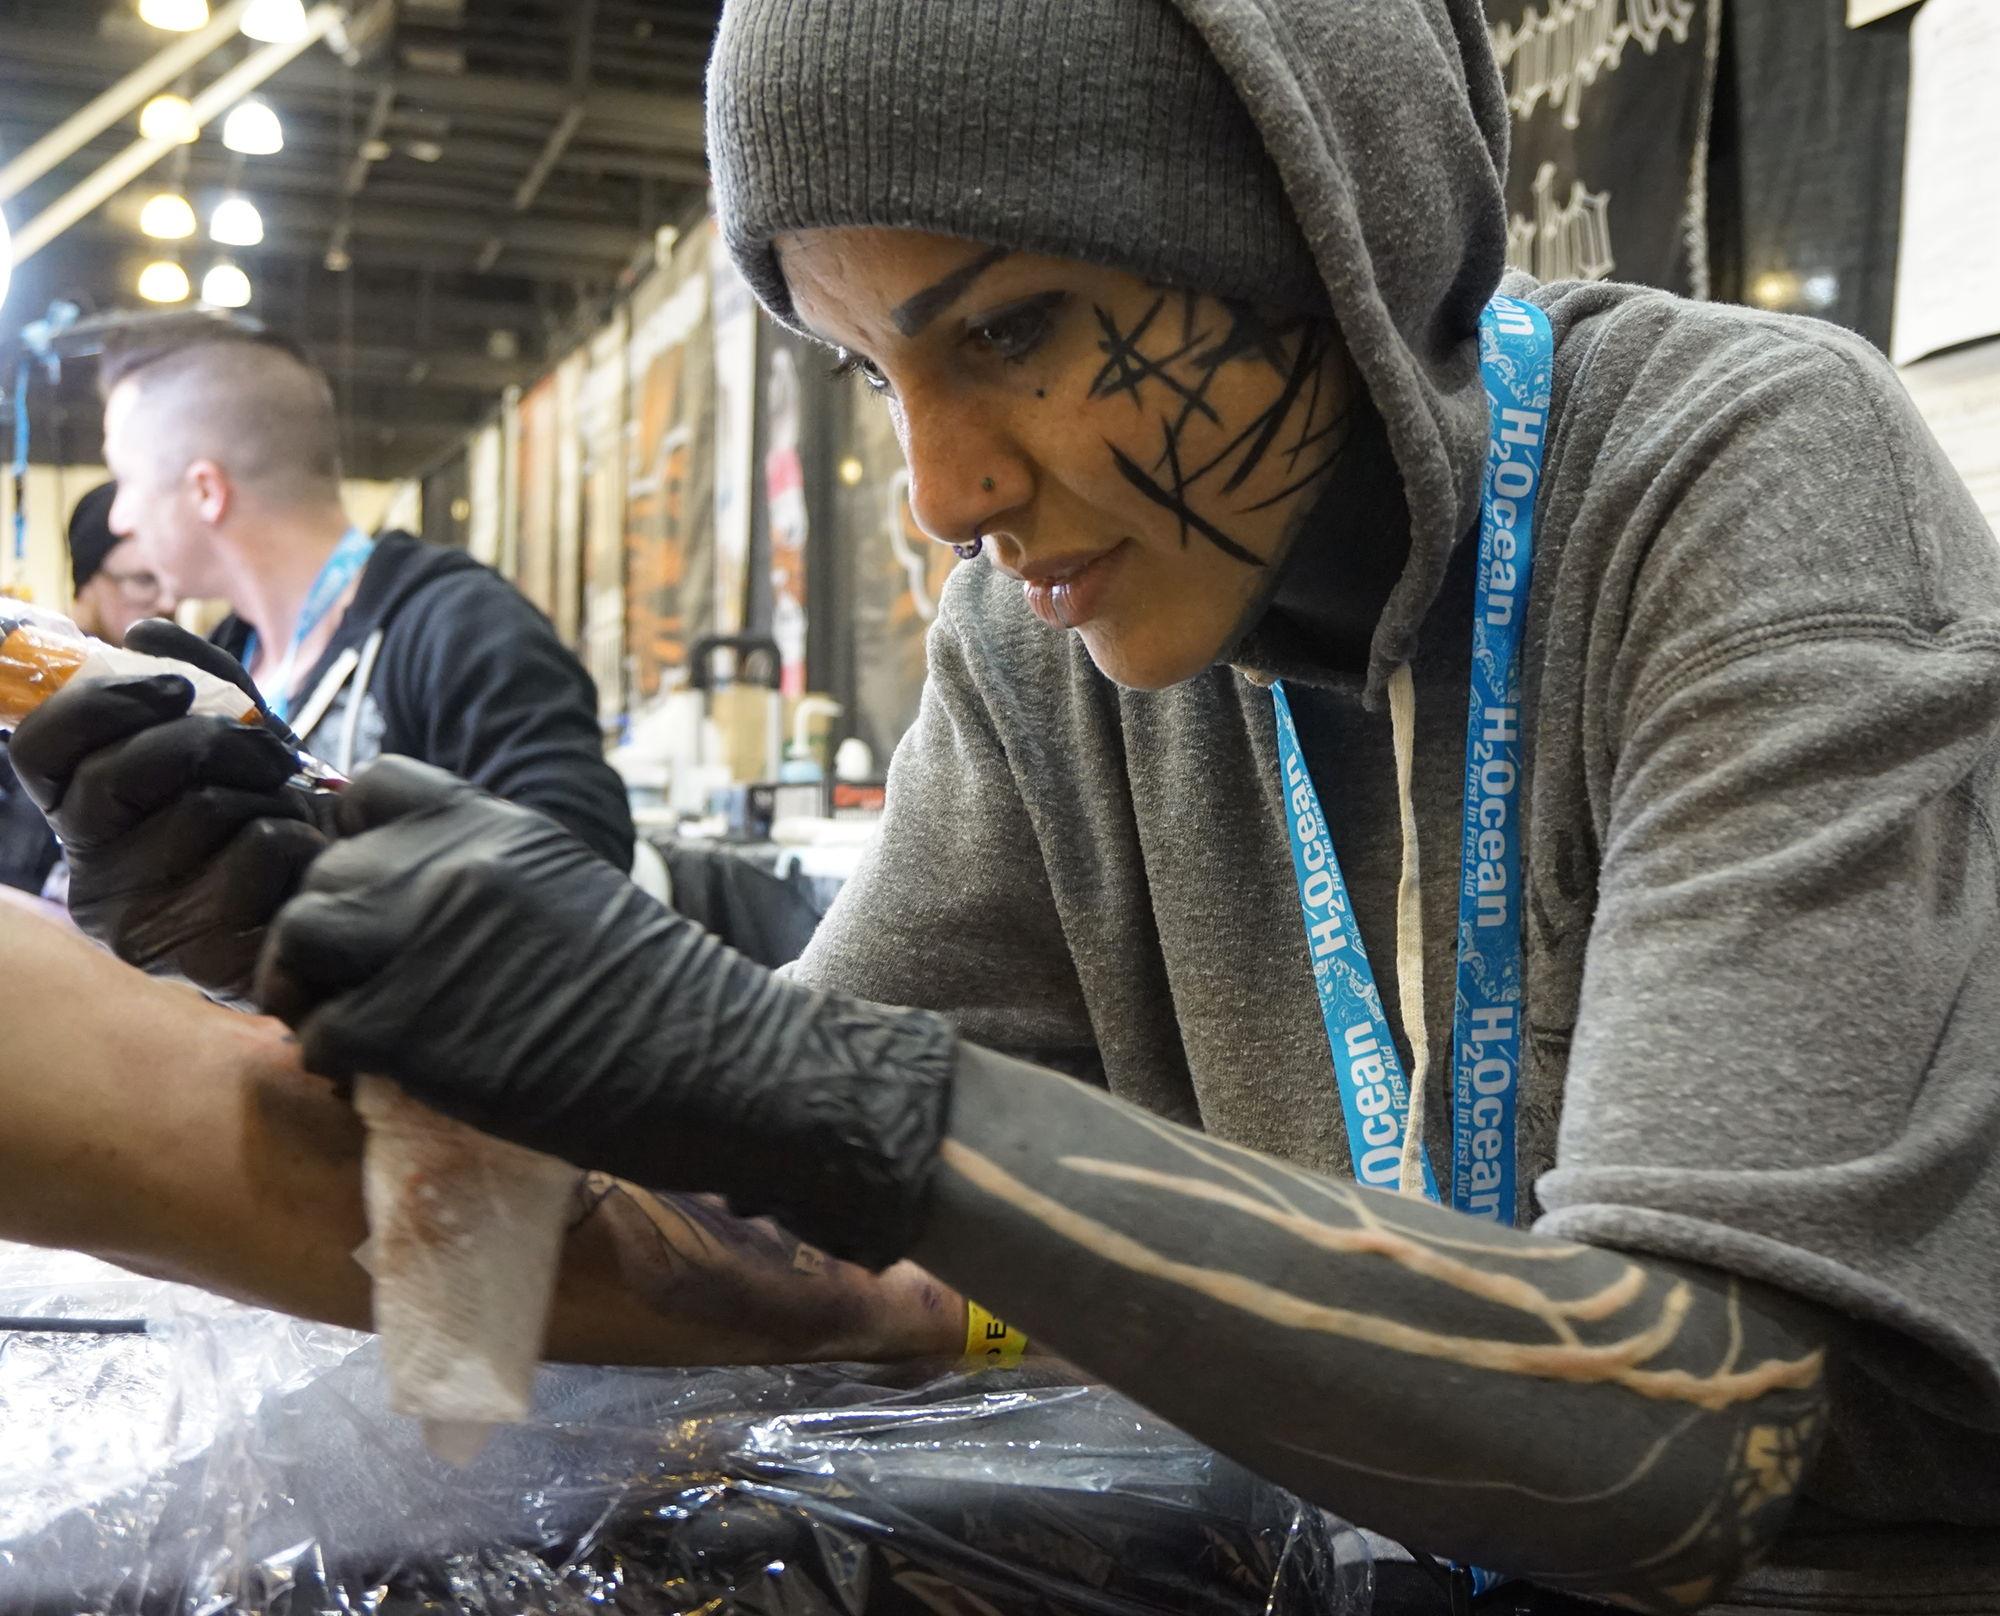 tattooer michela bottin at the golden state tattoo expo, california